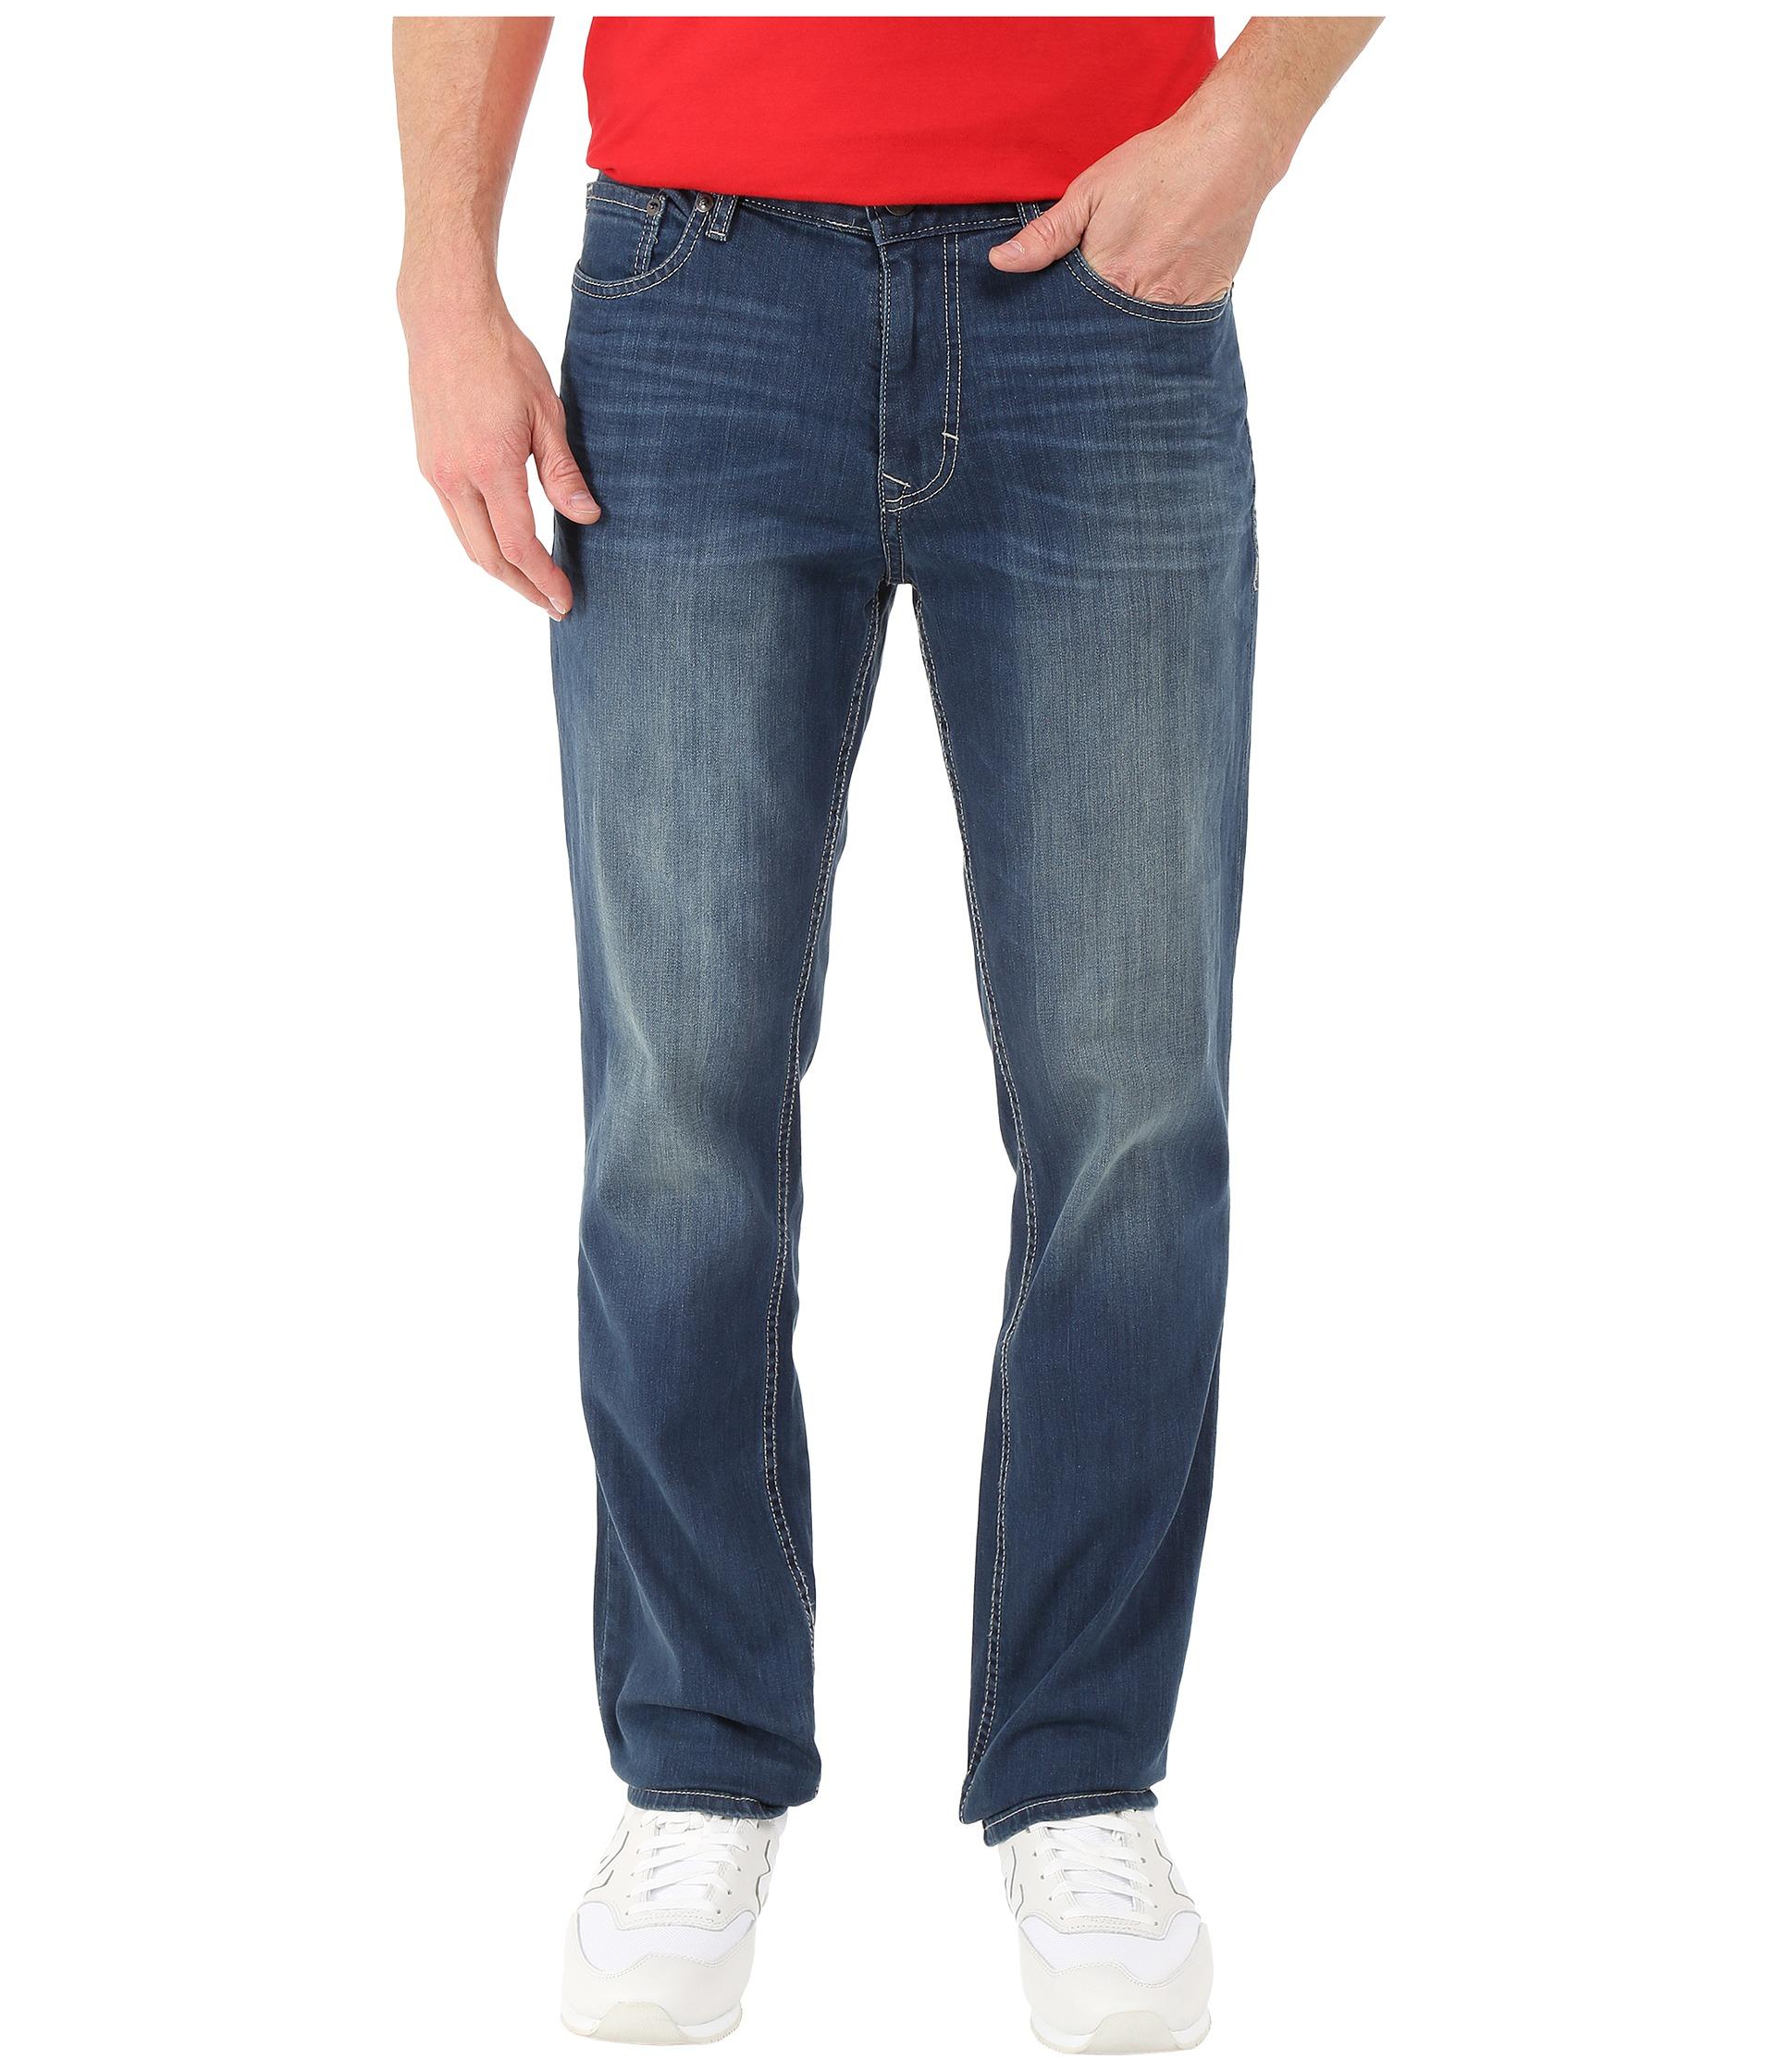 calvin klein jeans slim straight denim in authentic blue. Black Bedroom Furniture Sets. Home Design Ideas